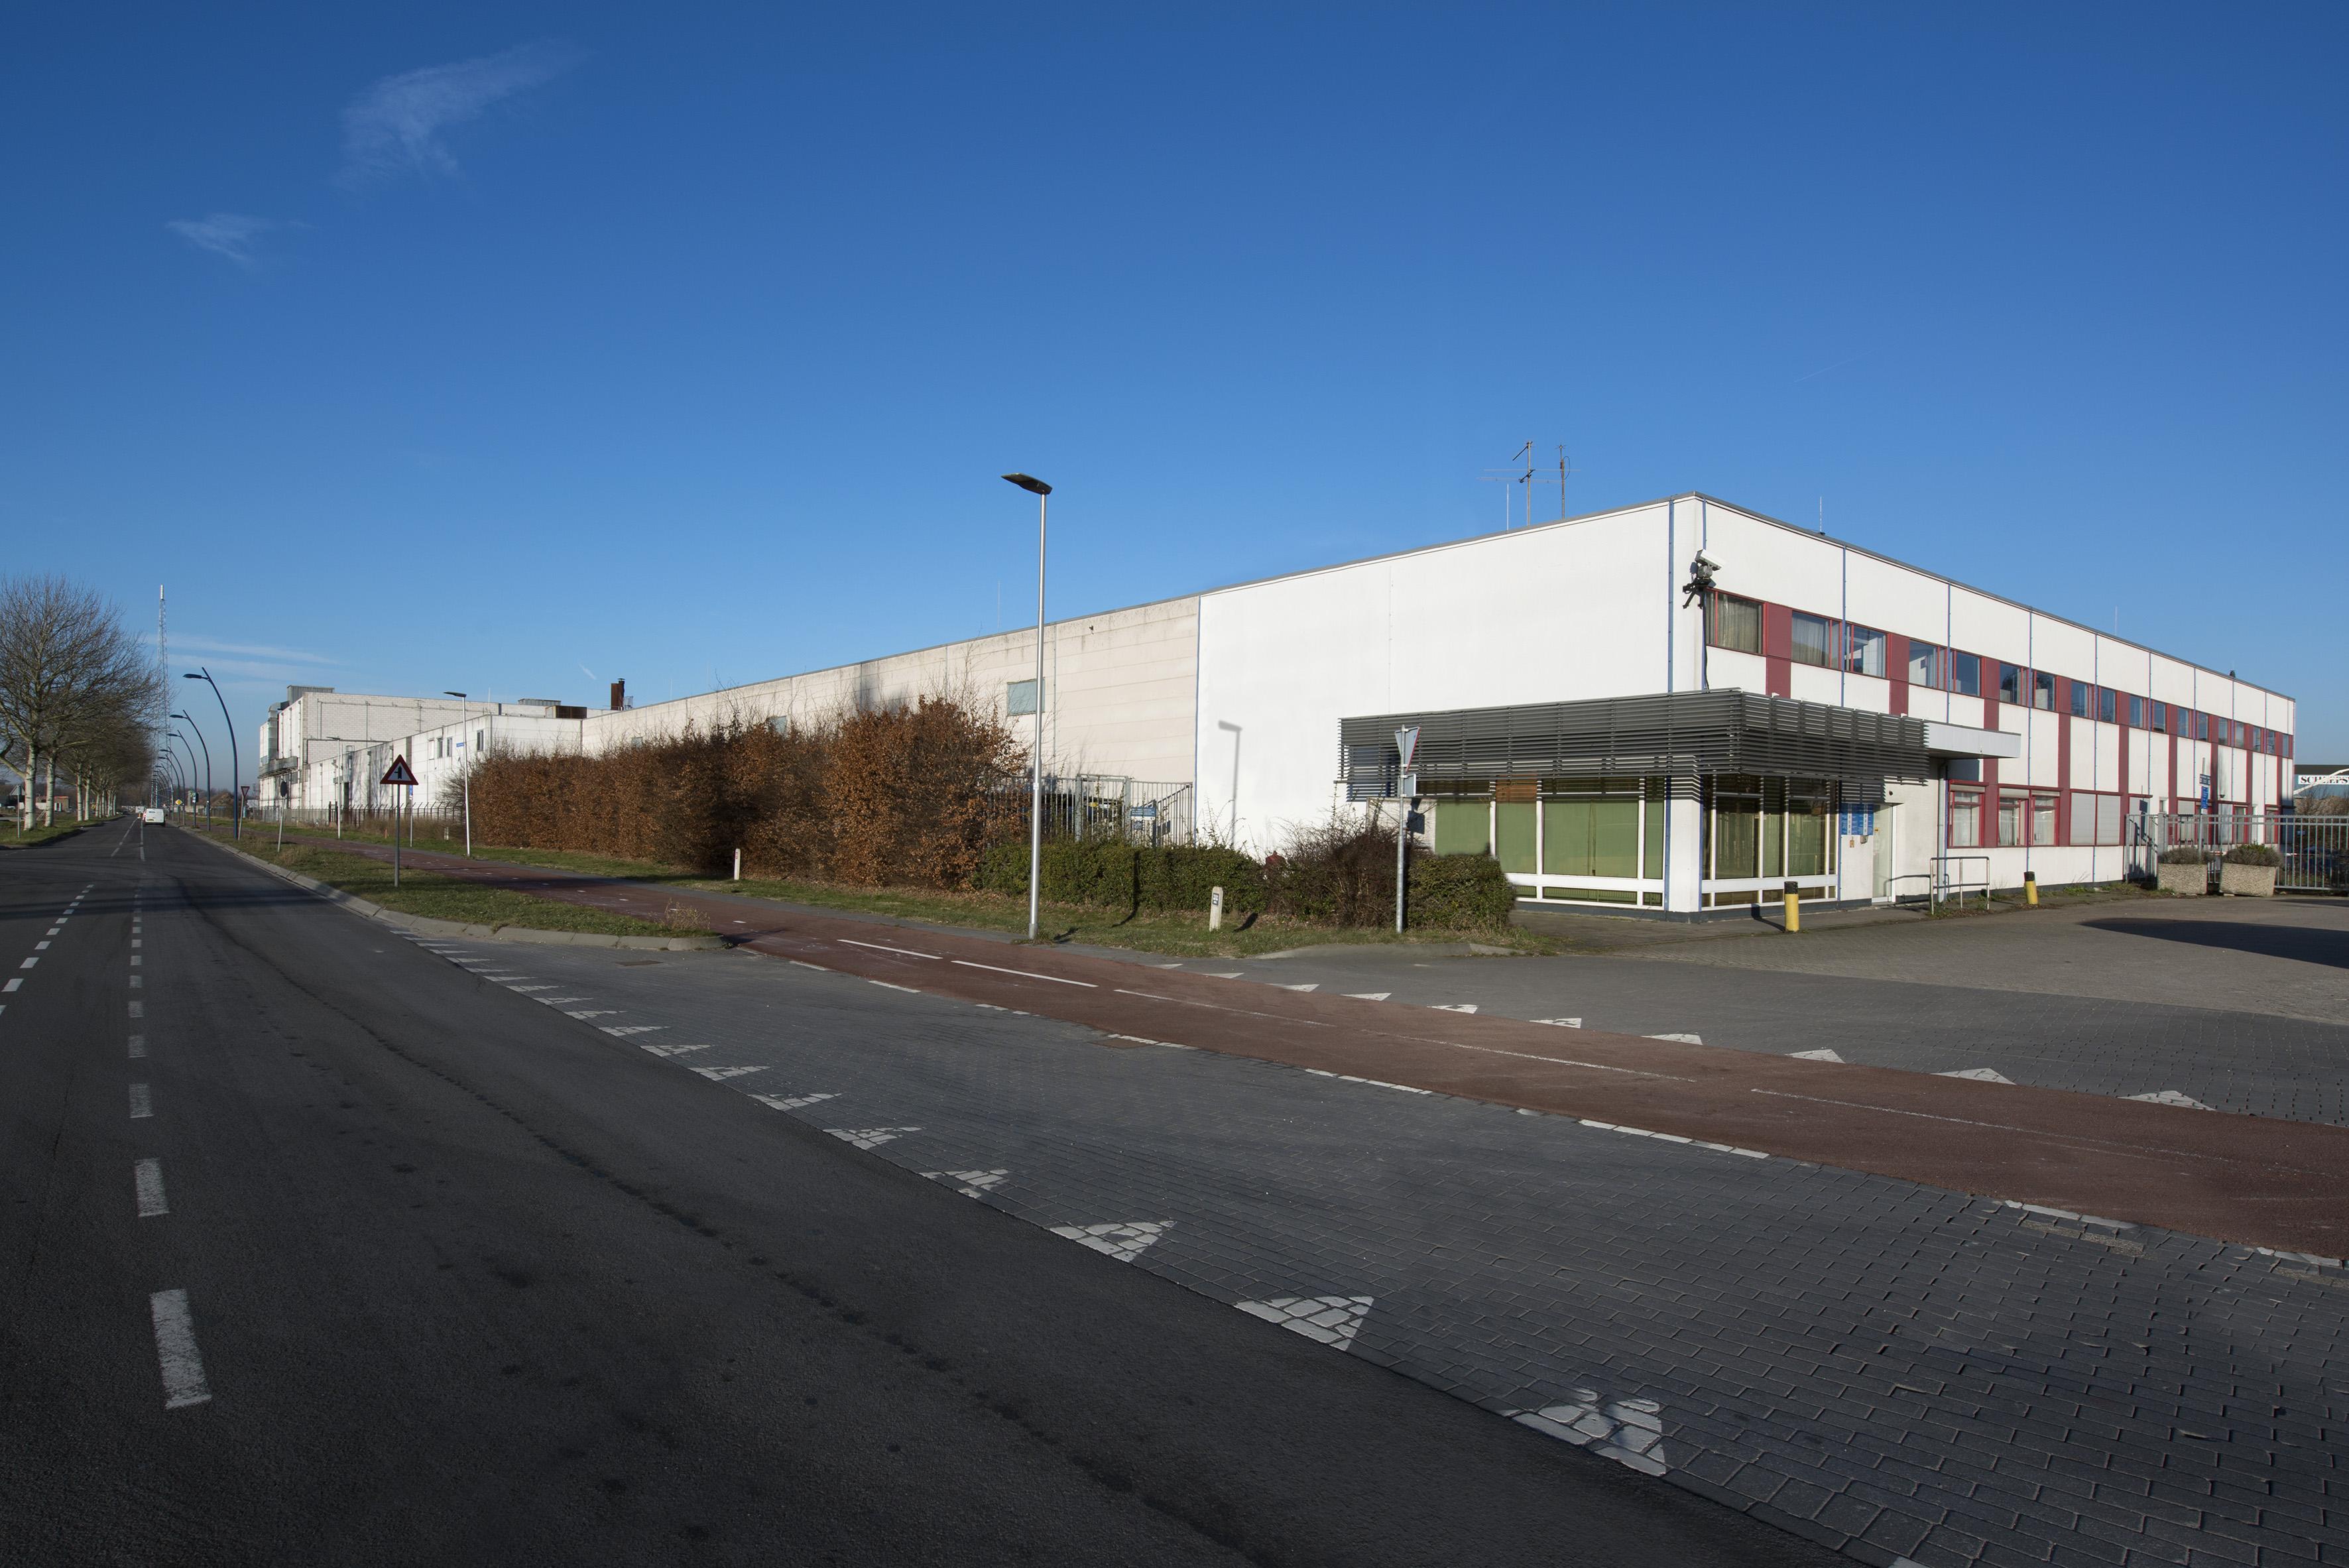 Nieuwe eigenaar sappie fabriek - PRmatters